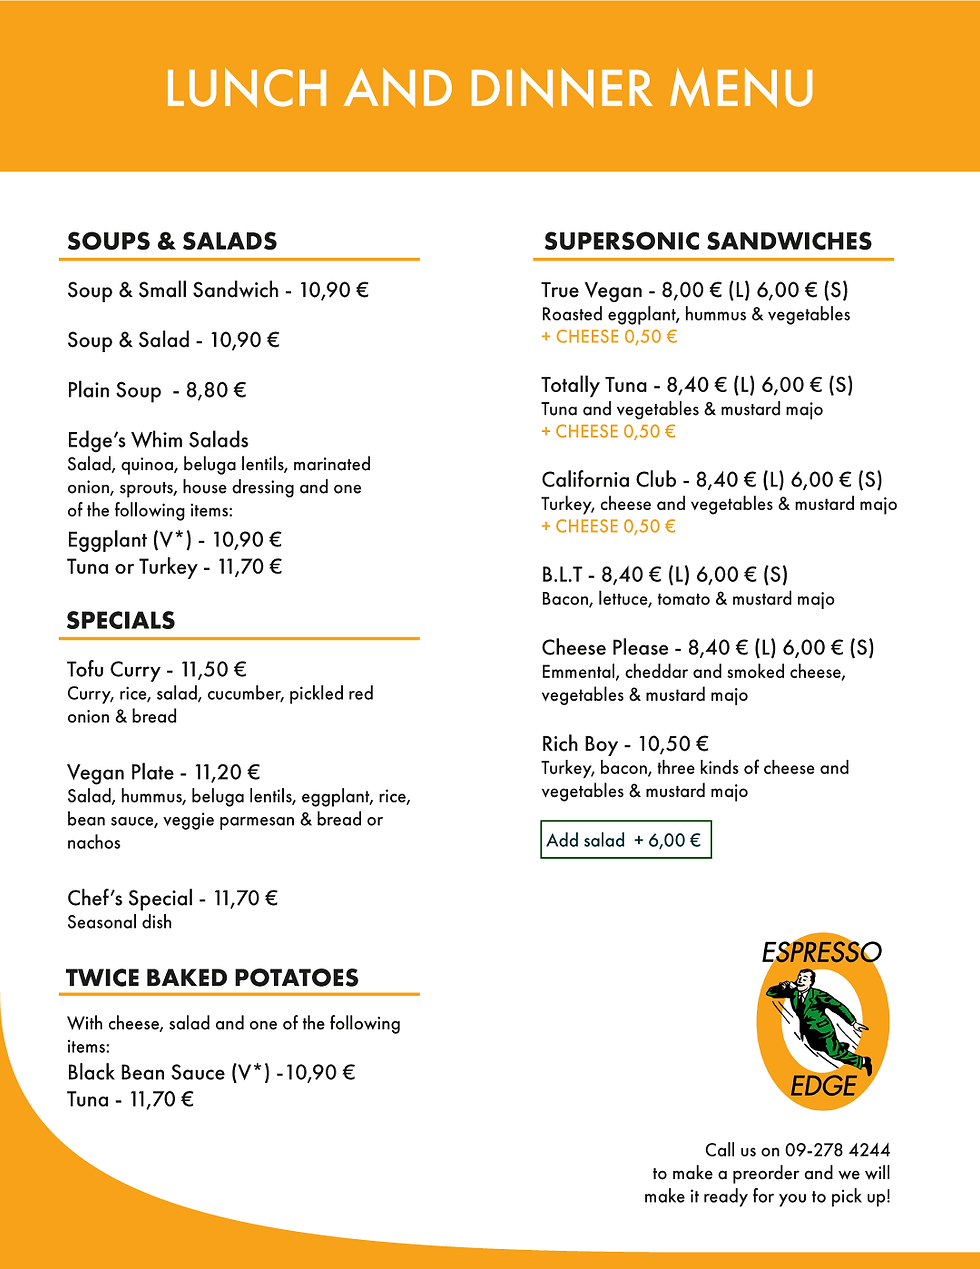 Espresso_edge_menu.png